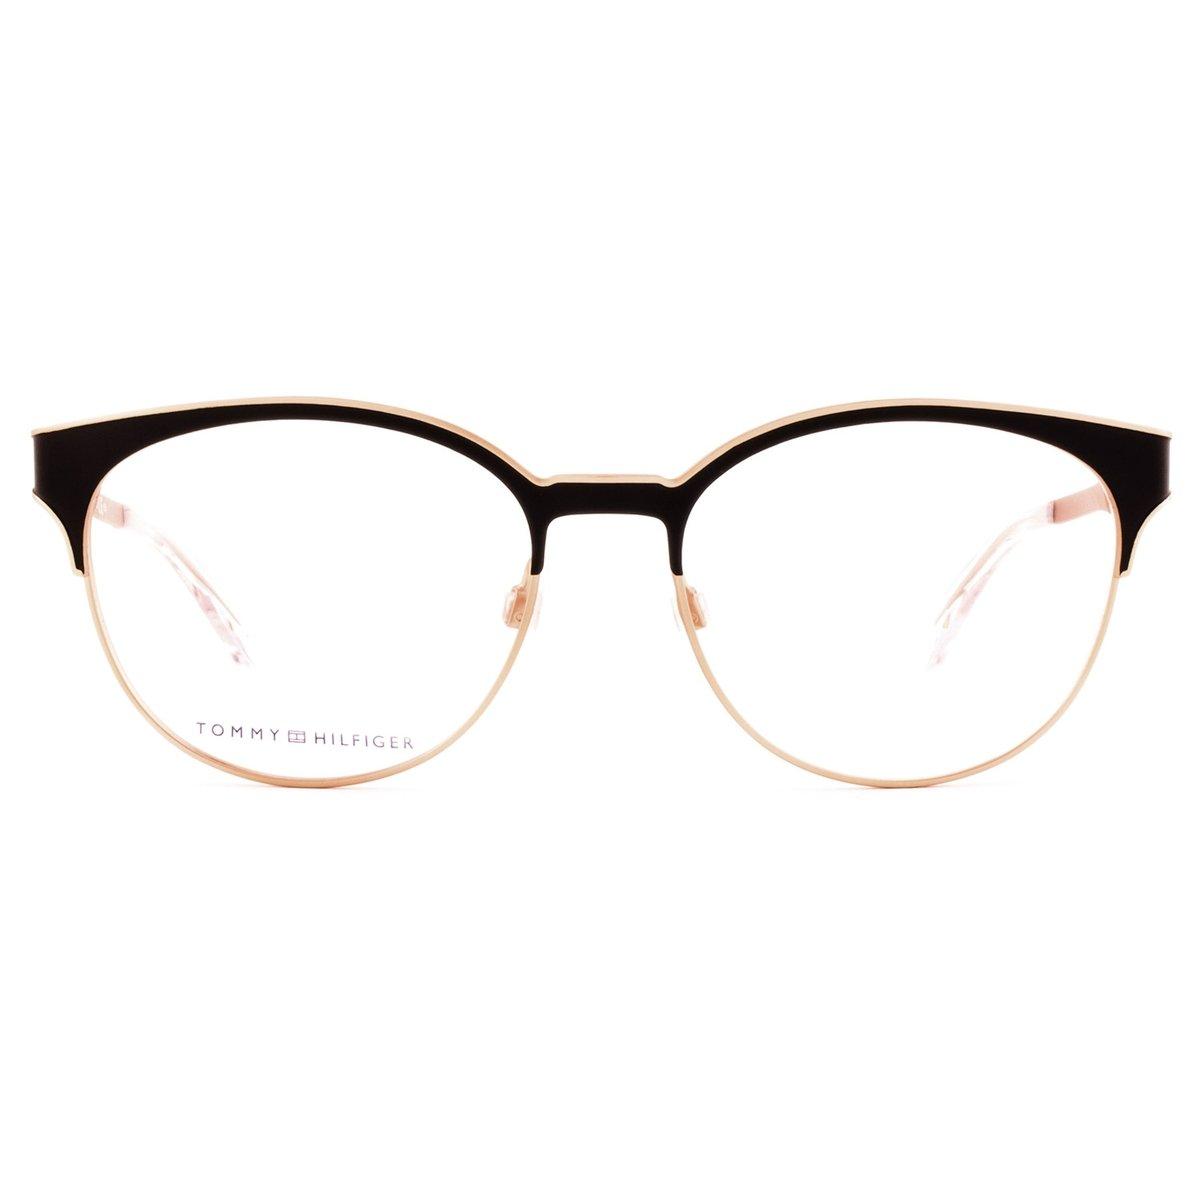 69d1f13c5c959 Óculos Tommy Hilfiger TH1359 K1T 52 - Compre Agora   Netshoes